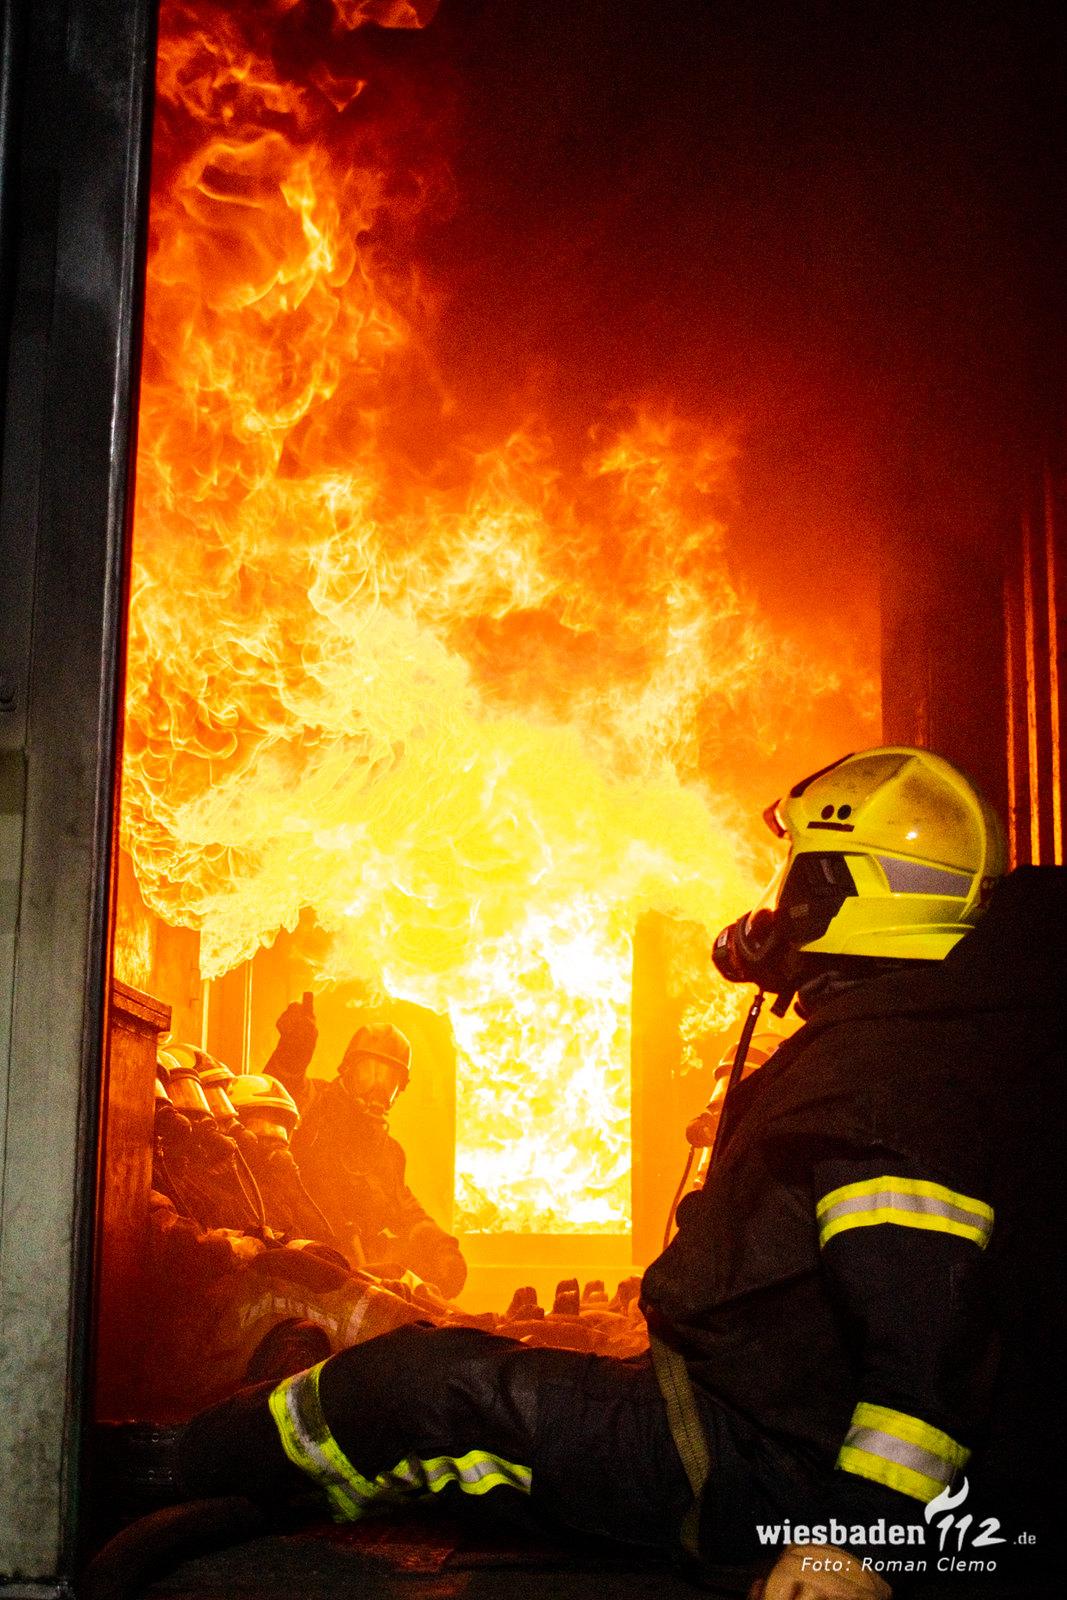 2019-07-12 Usingen Heißbrandausbildung